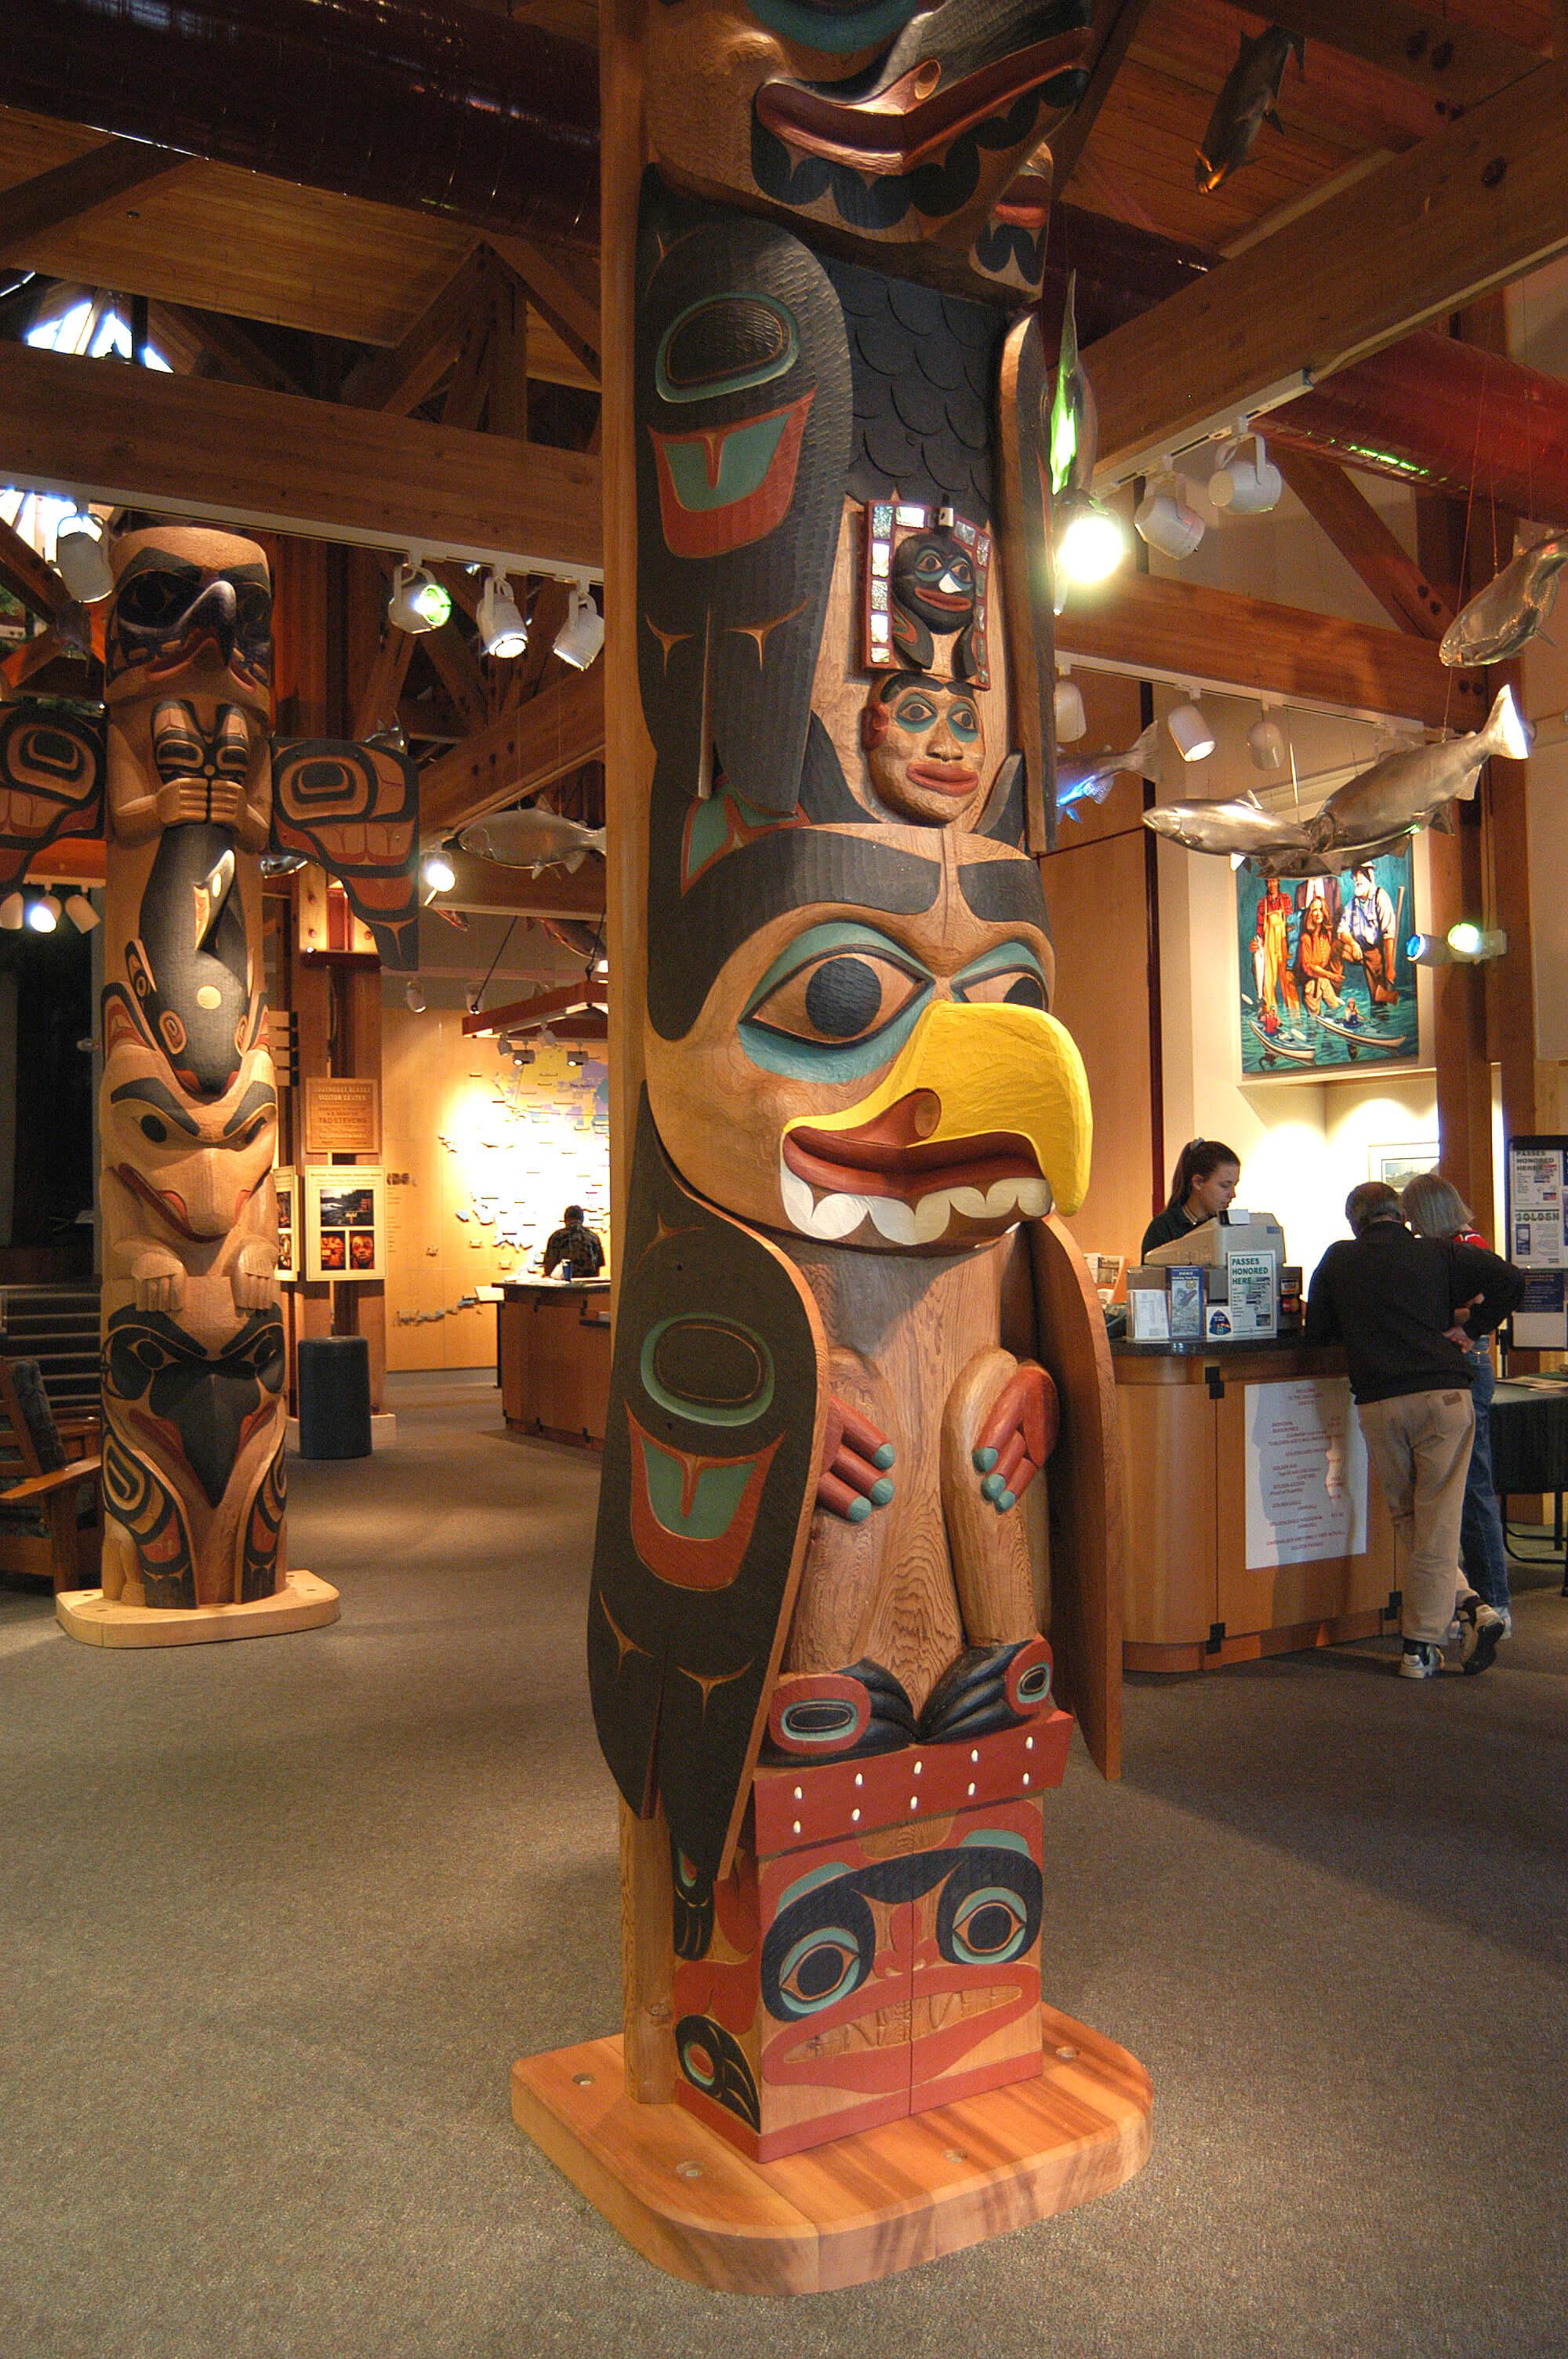 3-Southeast Alaska Discovery Center-The Sibbett Group-USFS-flickr-Tom Iraci.jpg